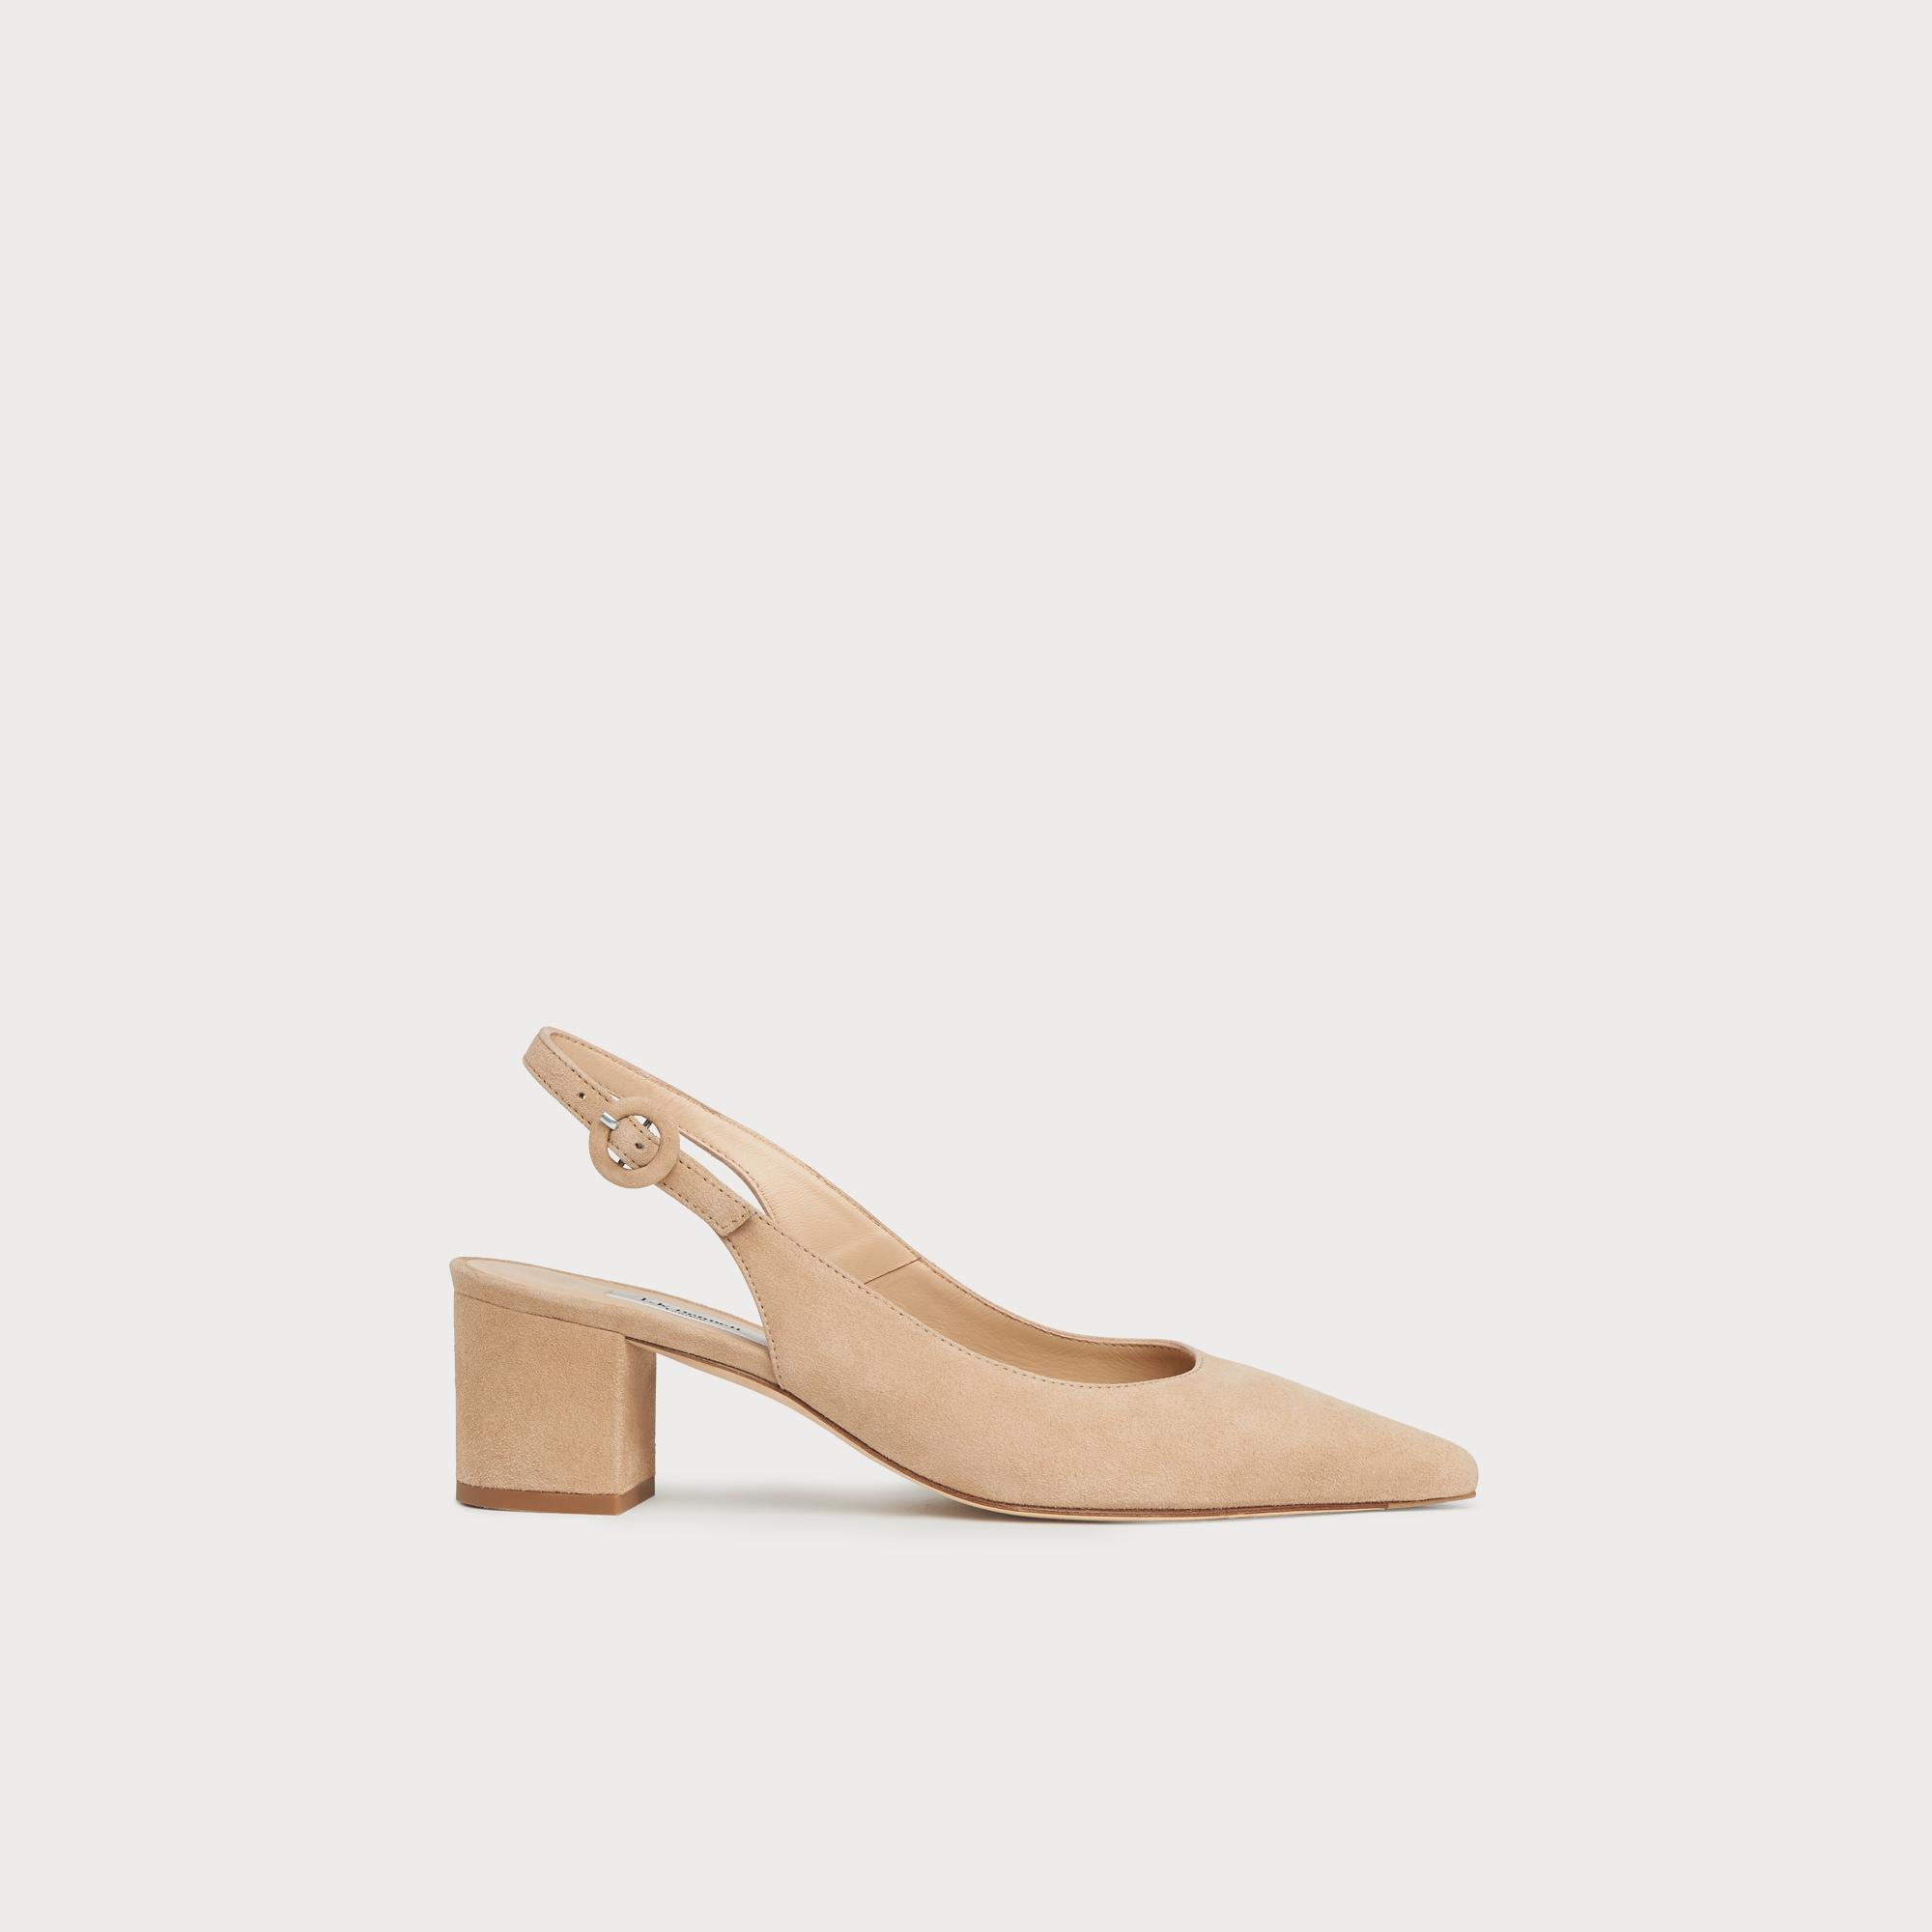 6062160069 Ada Beige Suede Block Heel Slingbacks | Shoes | L.K.Bennett